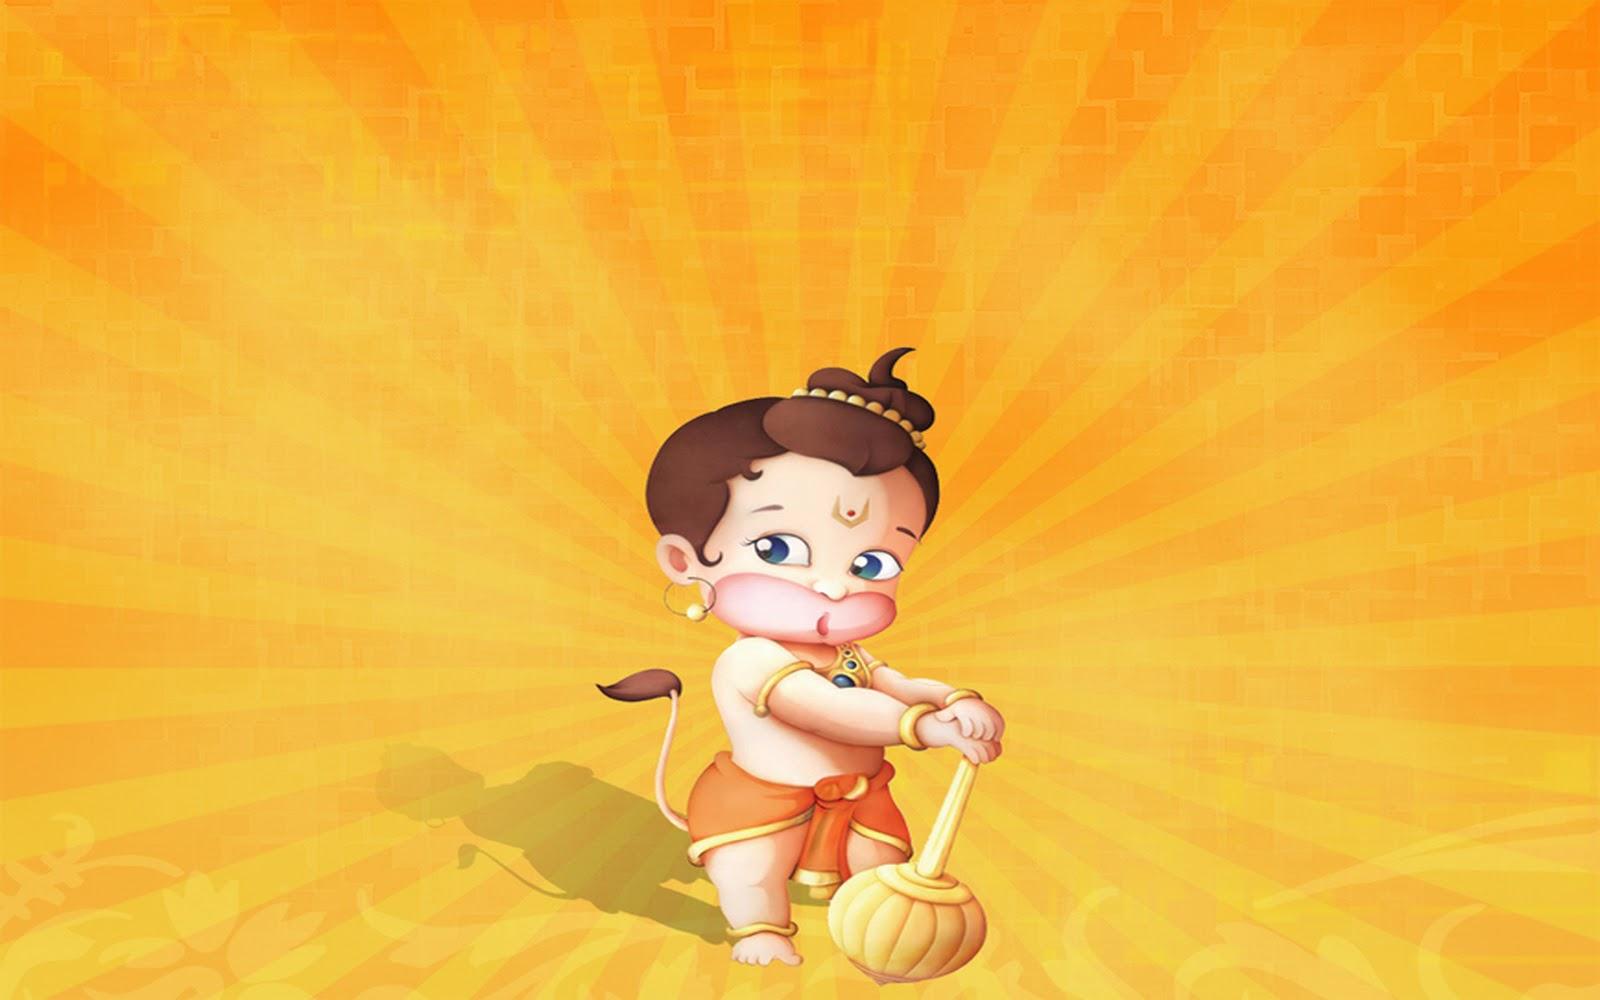 khushi for life new hd funny cartoon hanuman wallpaper images